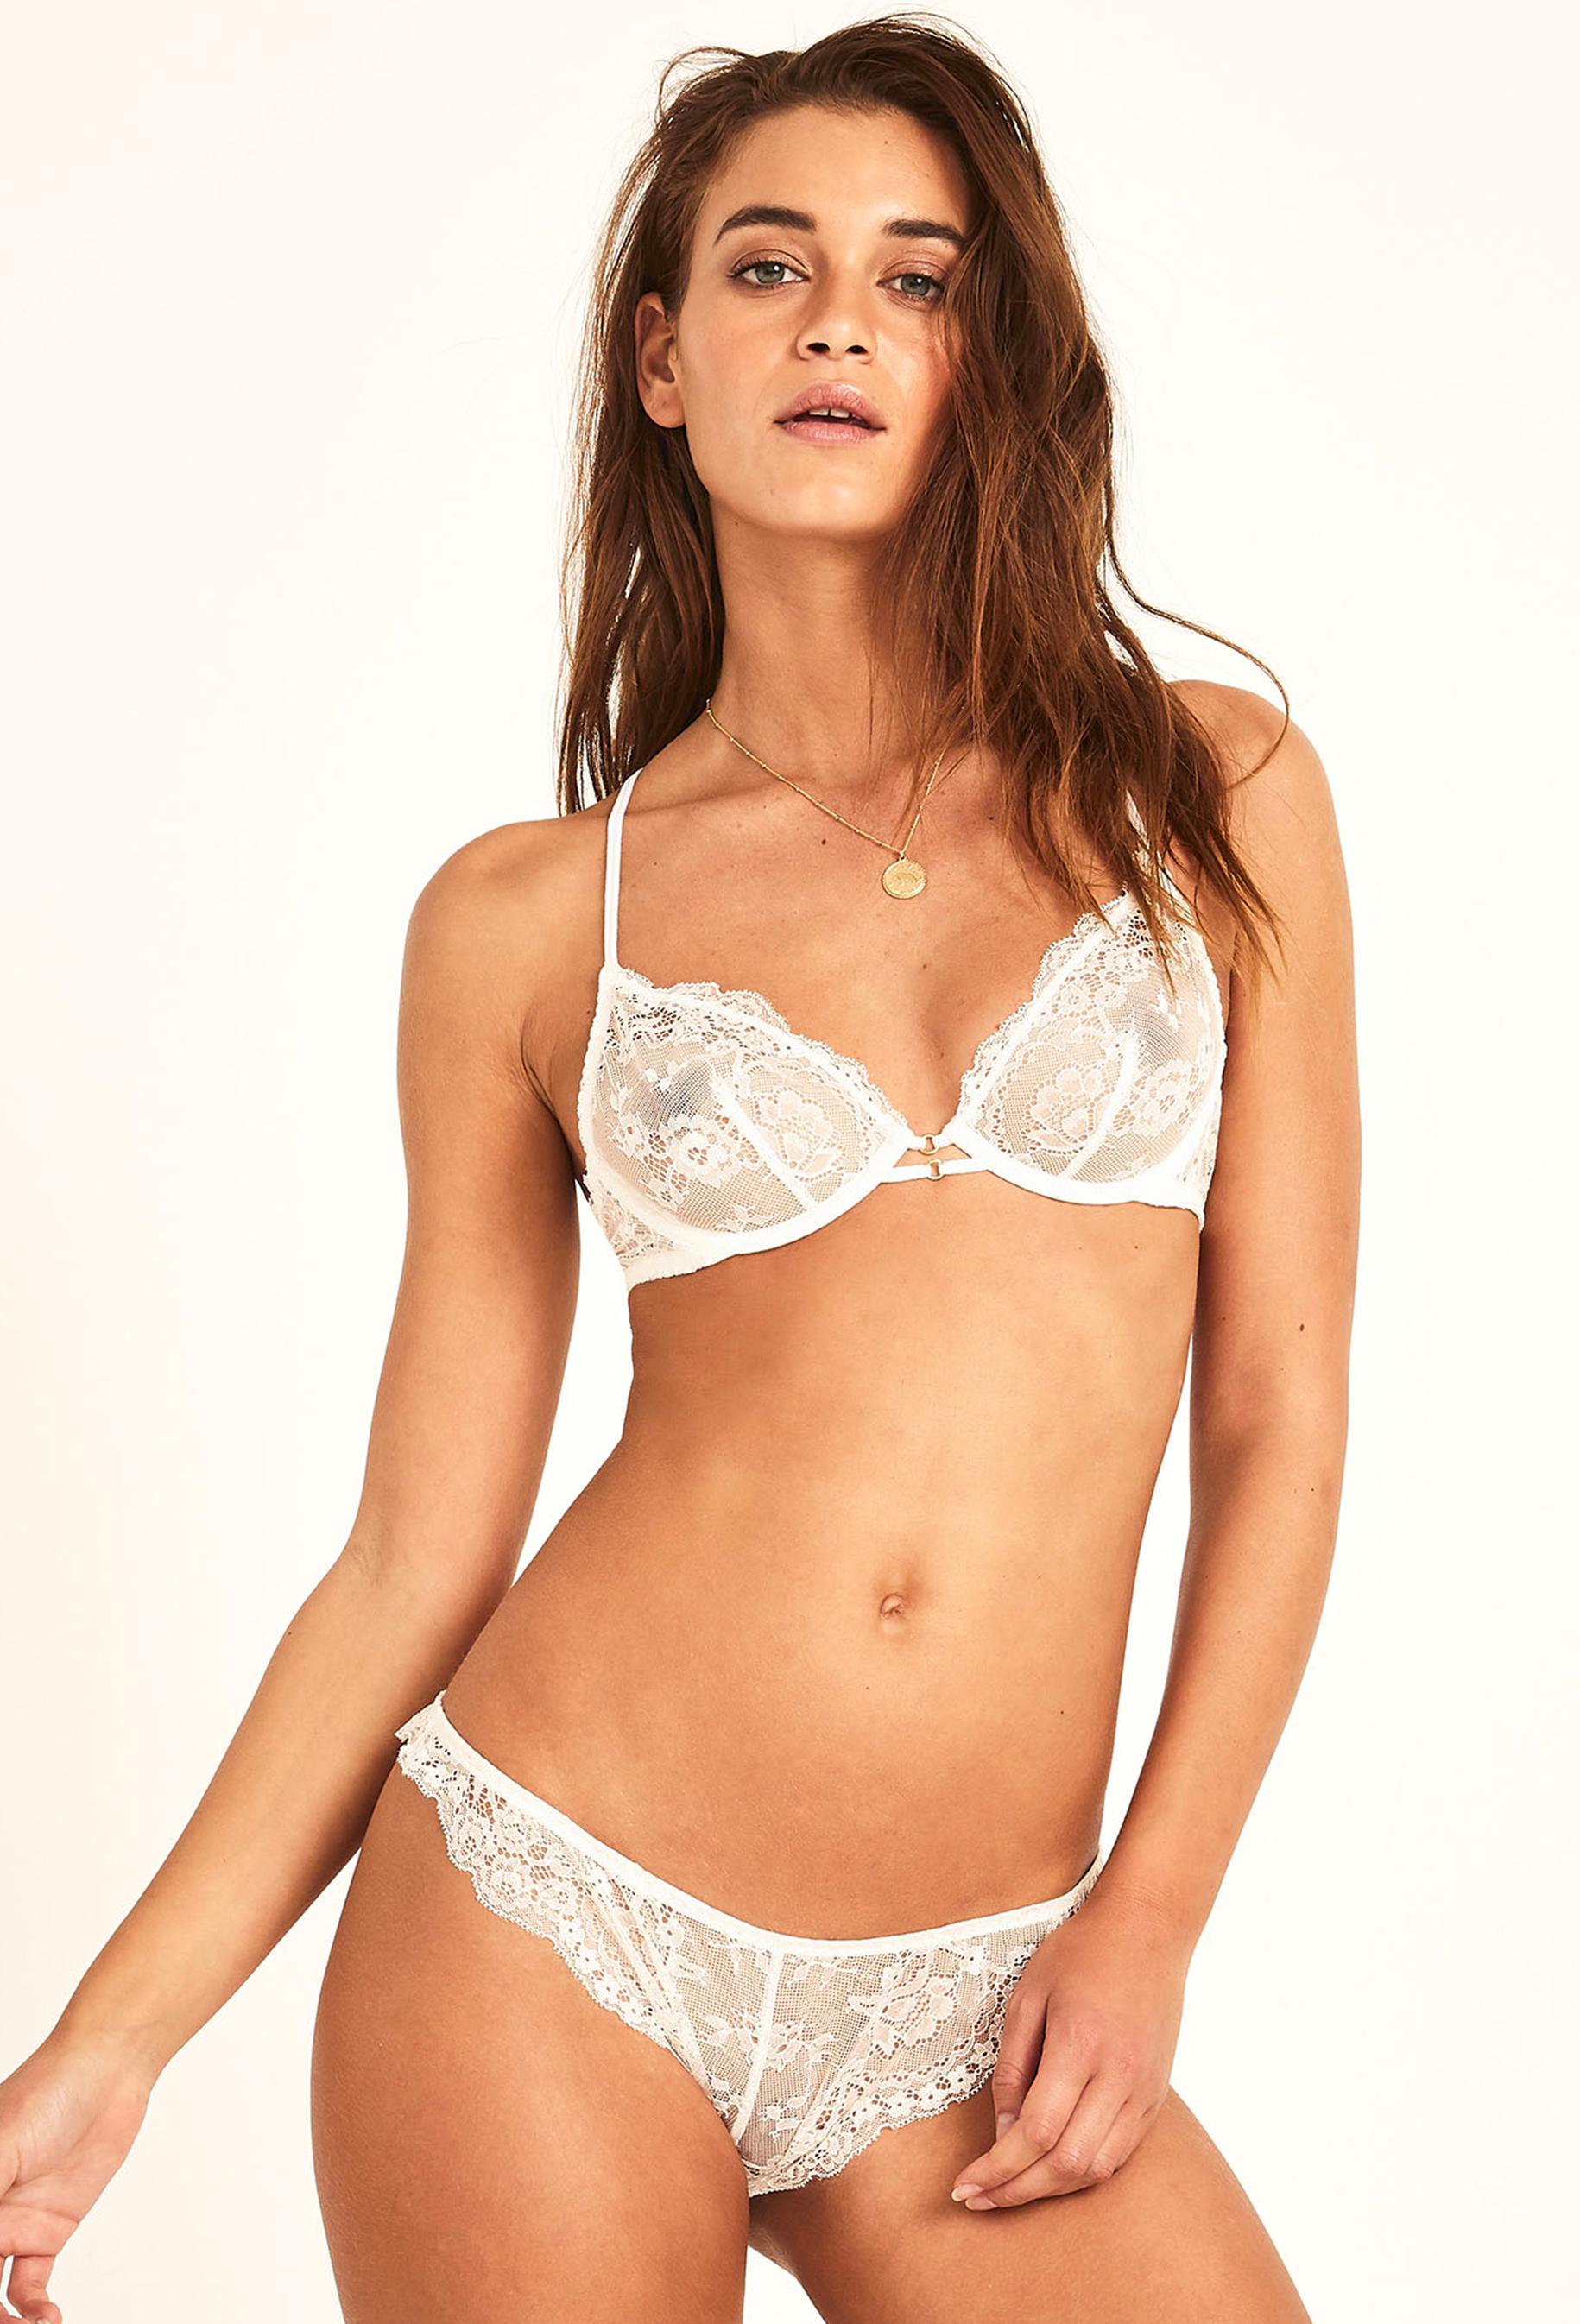 lingerie tanga Gala Ivoire 19 € Girls In Paris photo 3